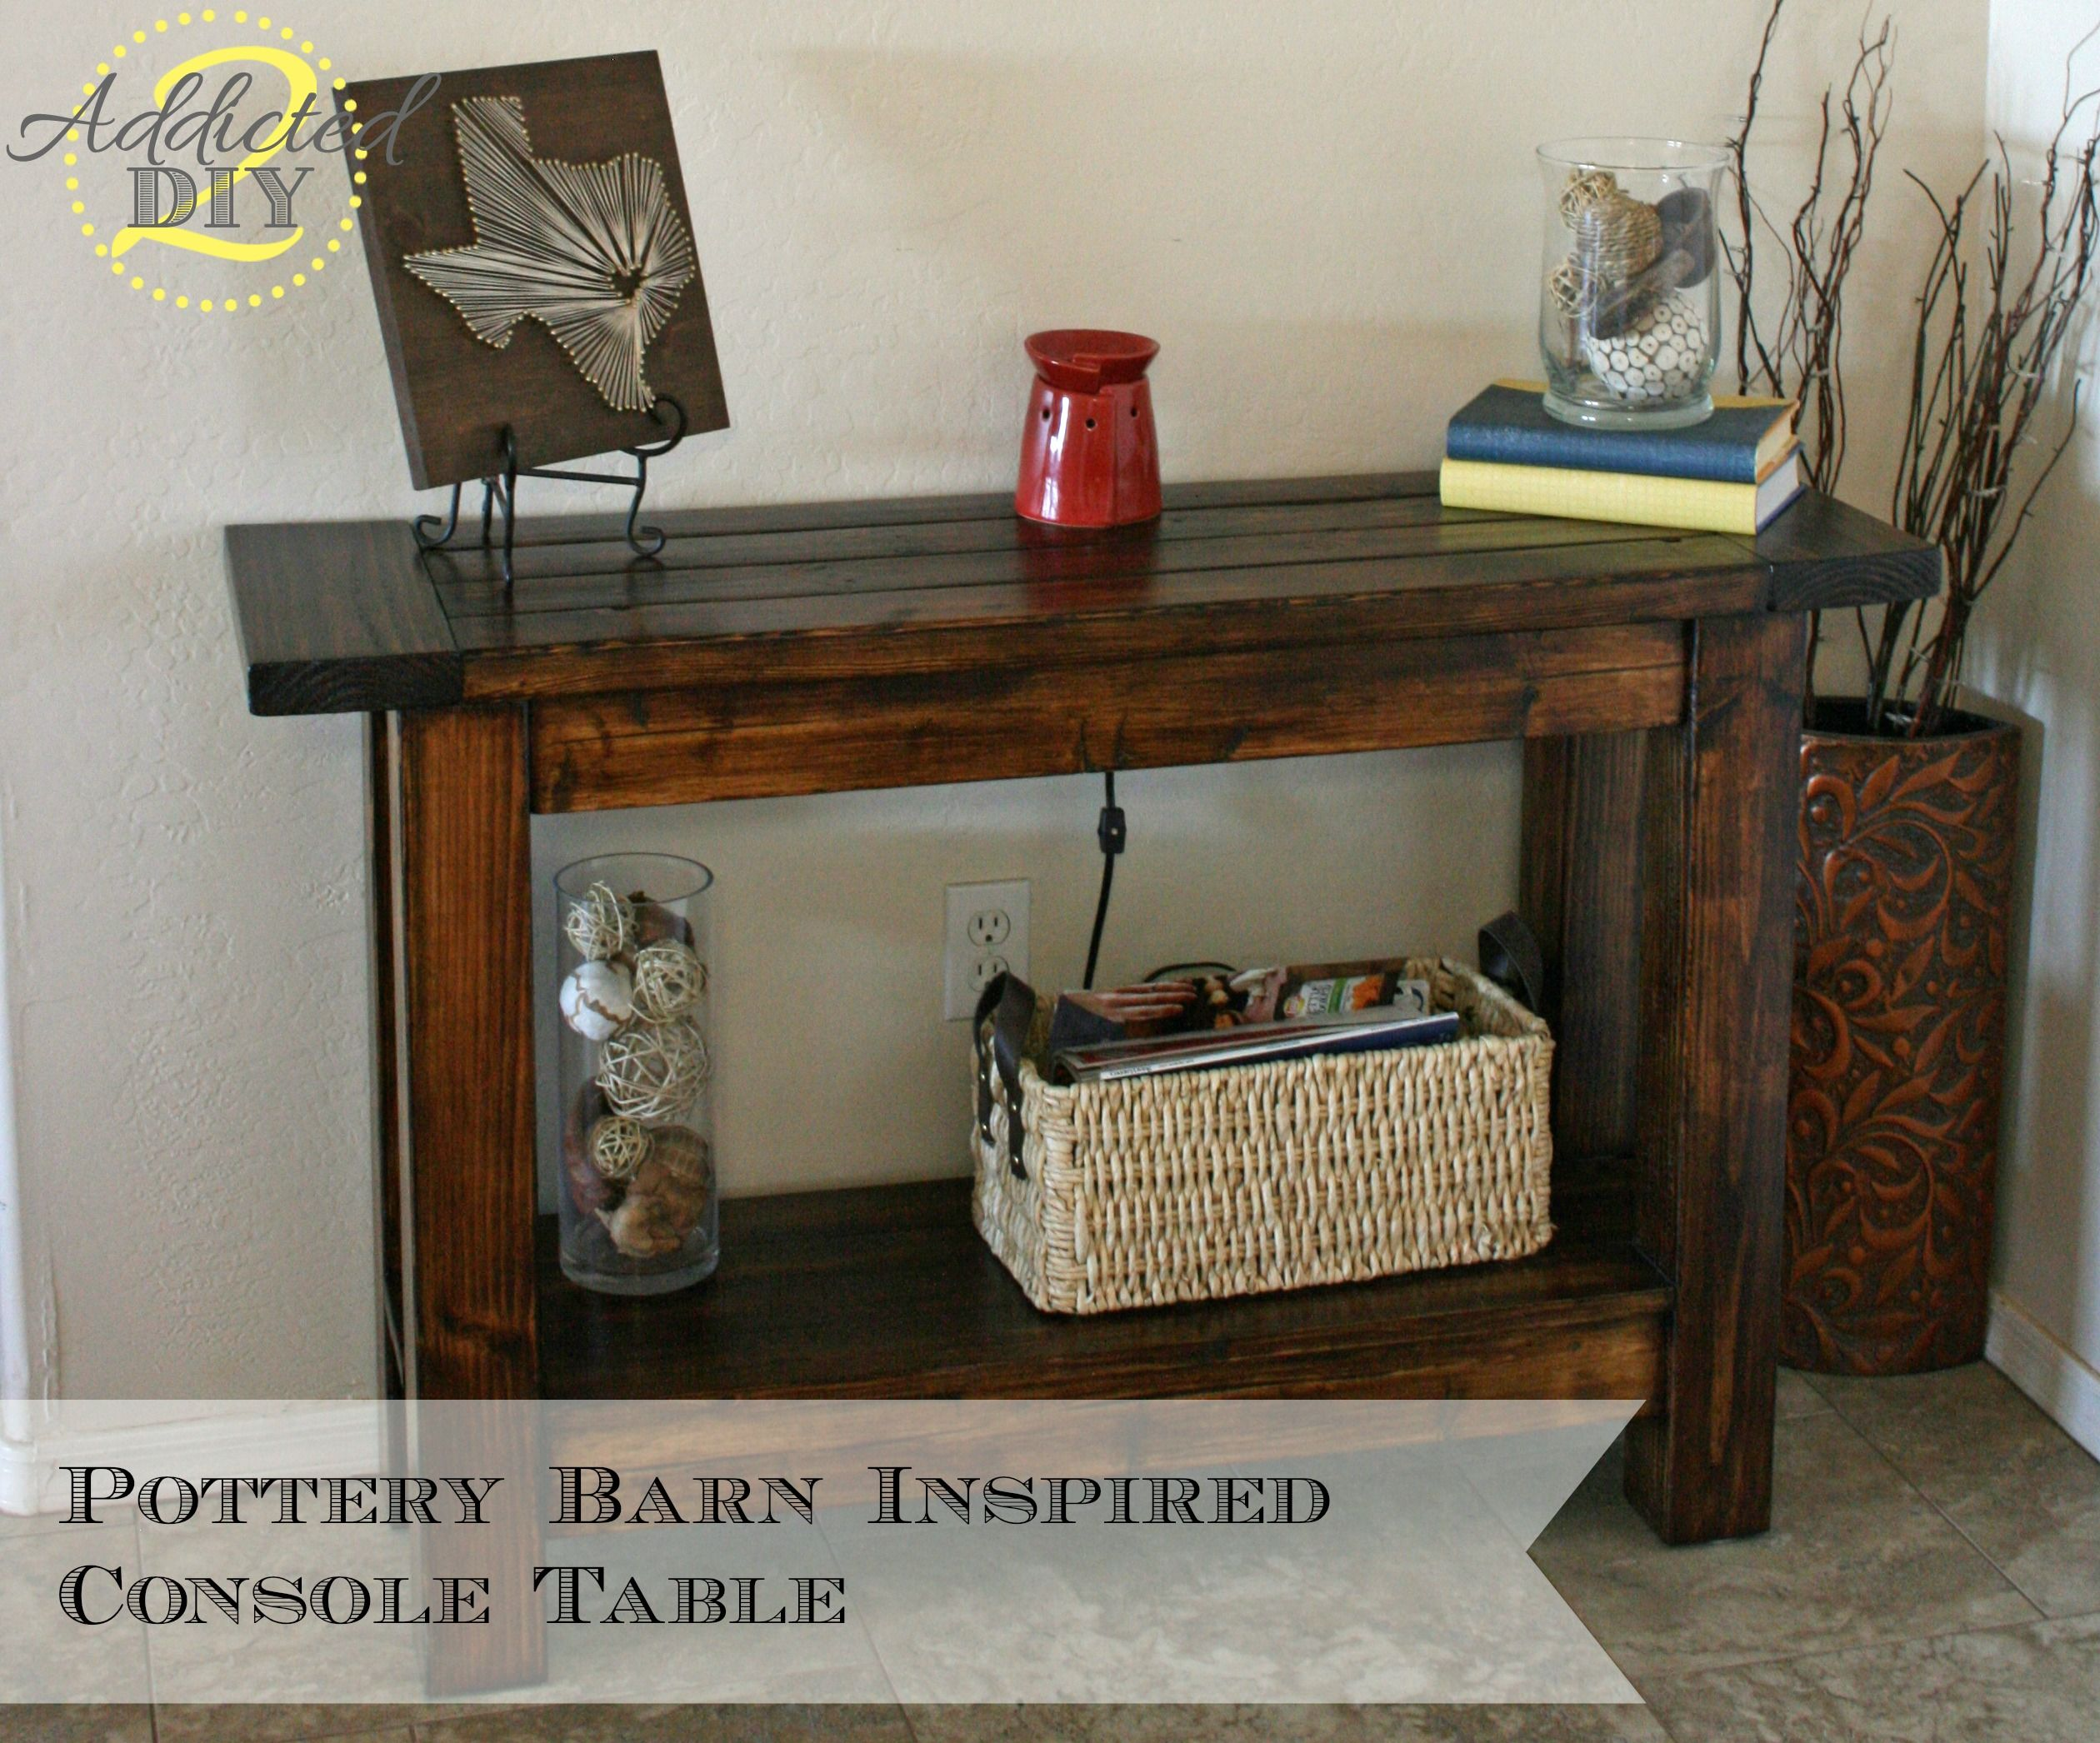 Pottery Barn Inspired Console Table Room Decor Diy Console Table Decor